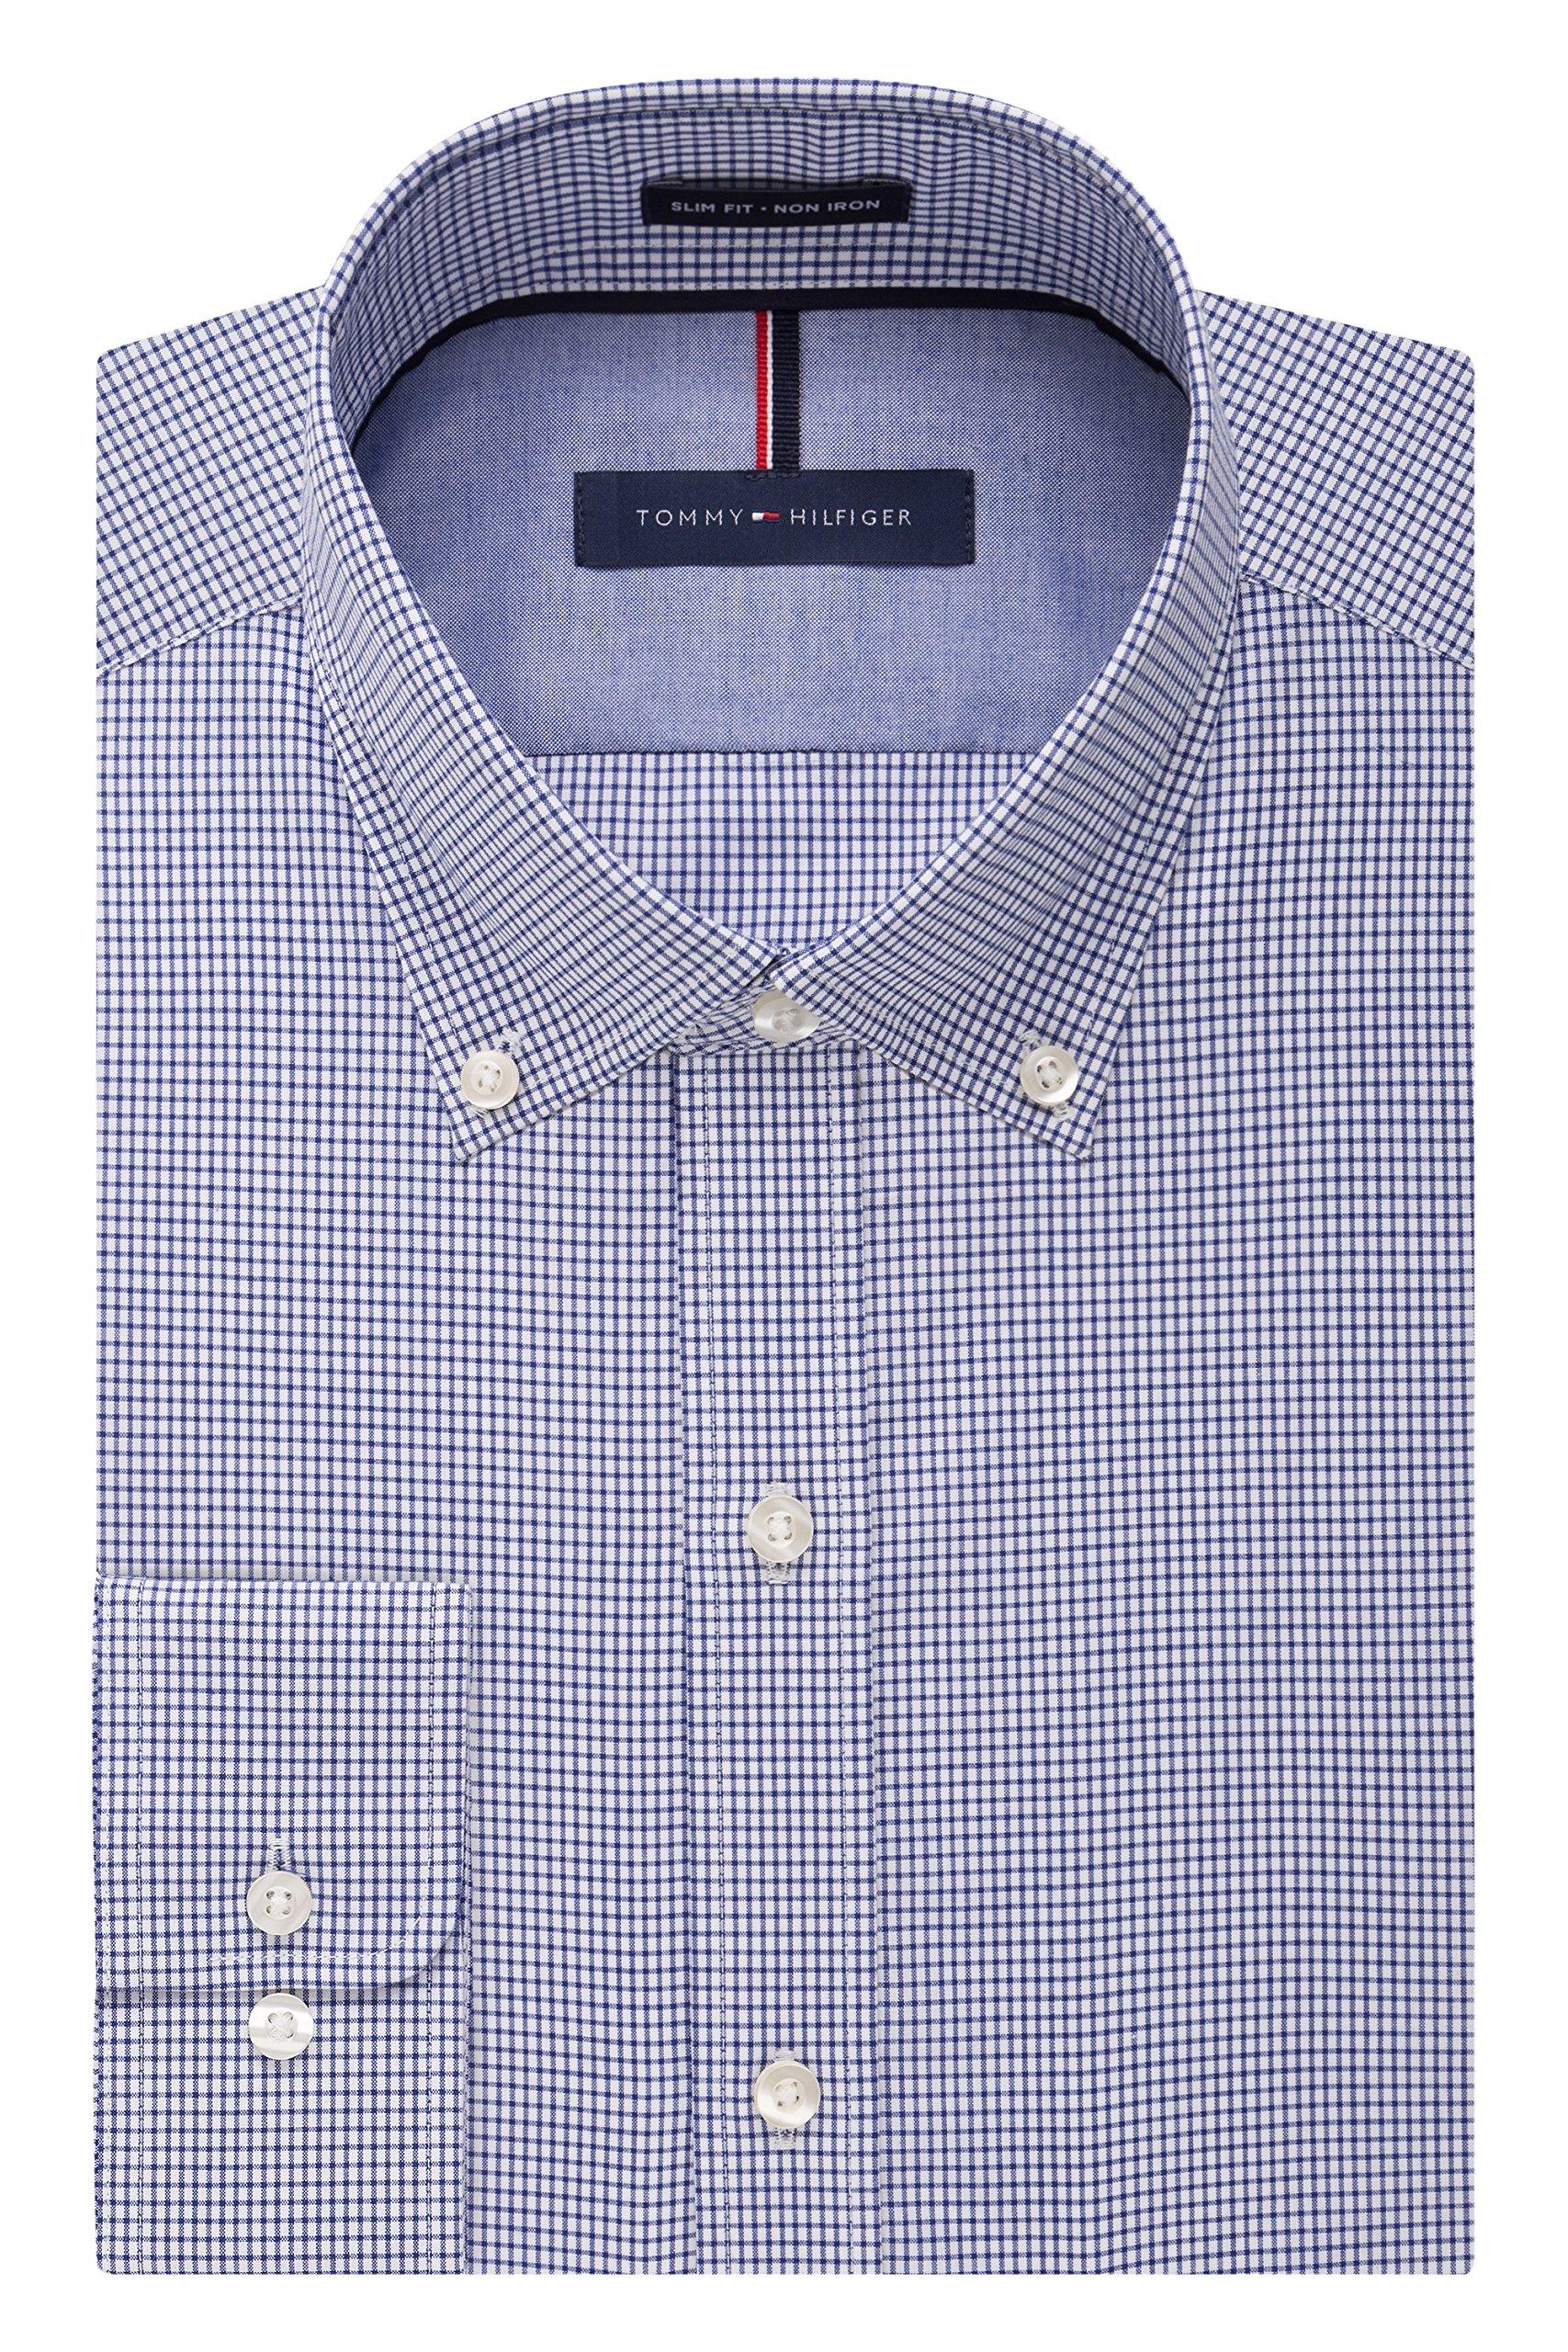 Tommy Hilfiger Men's Non Iron Slim Fit Check Button Down Collar Dress Shirt, Ocean, 16.5'' Neck 34''-35'' Sleeve